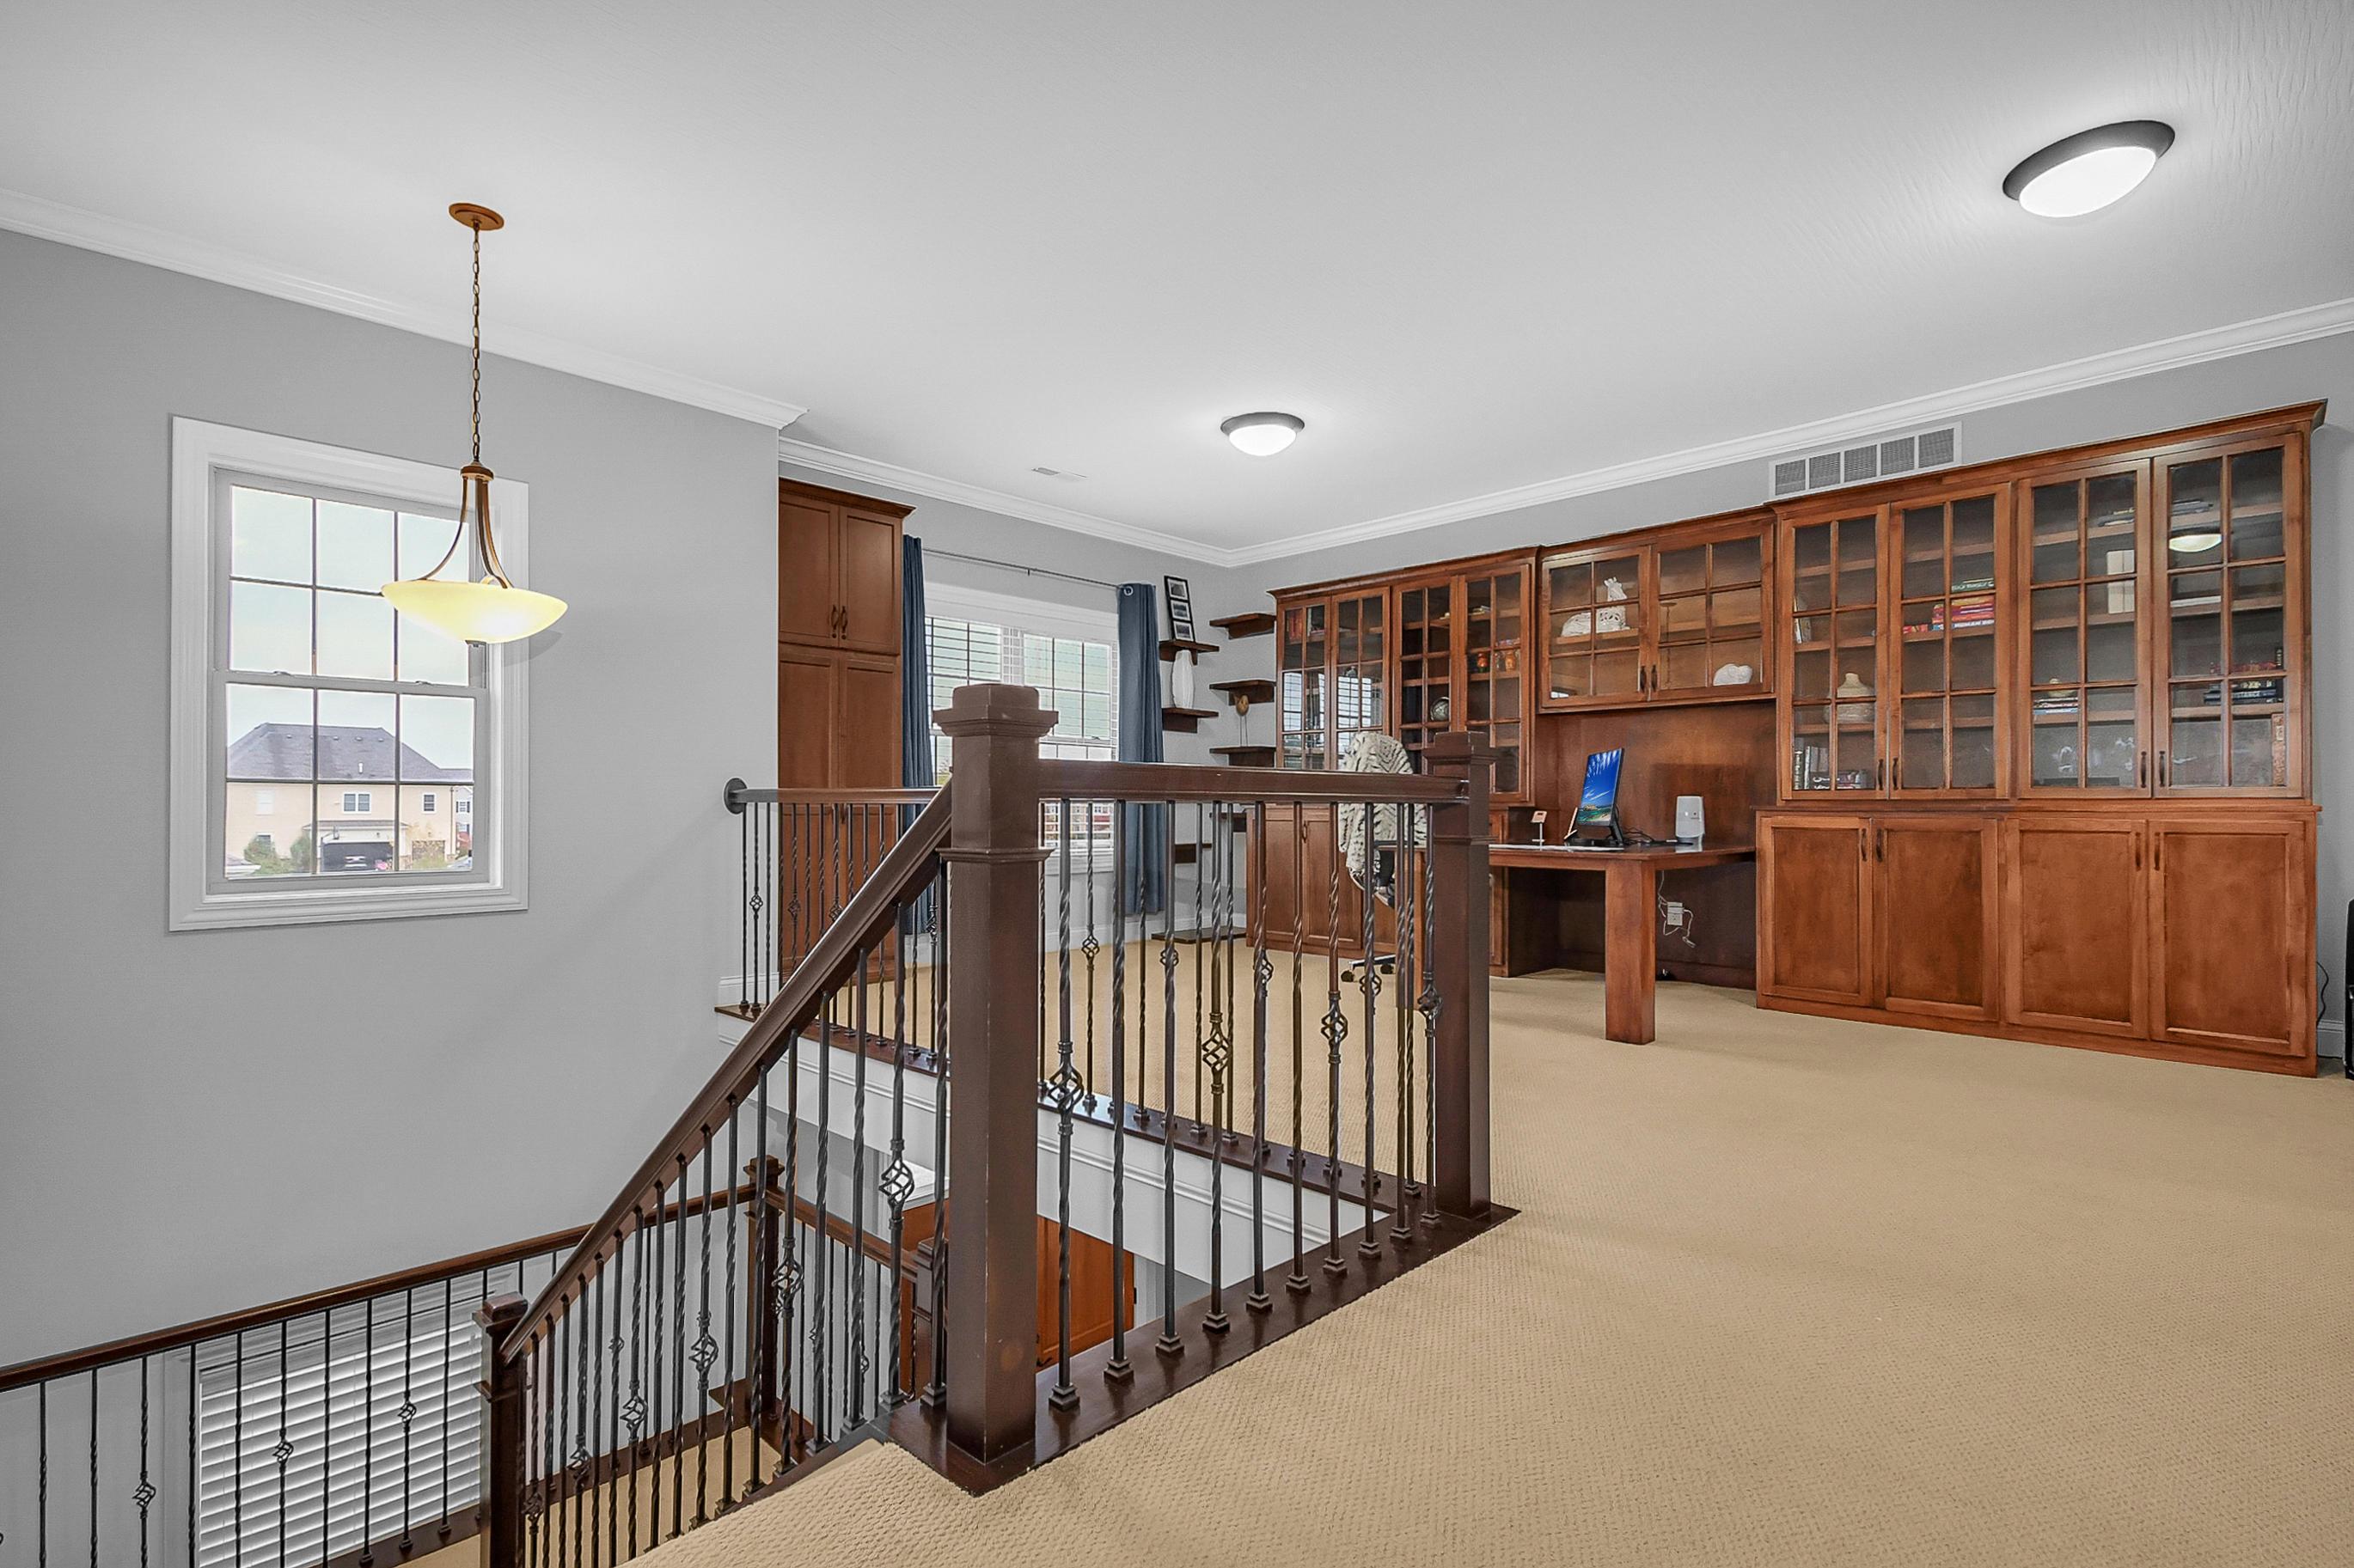 6869 Enfield, Dublin, Ohio 43017, 5 Bedrooms Bedrooms, ,5 BathroomsBathrooms,Residential,For Sale,Enfield,220038176